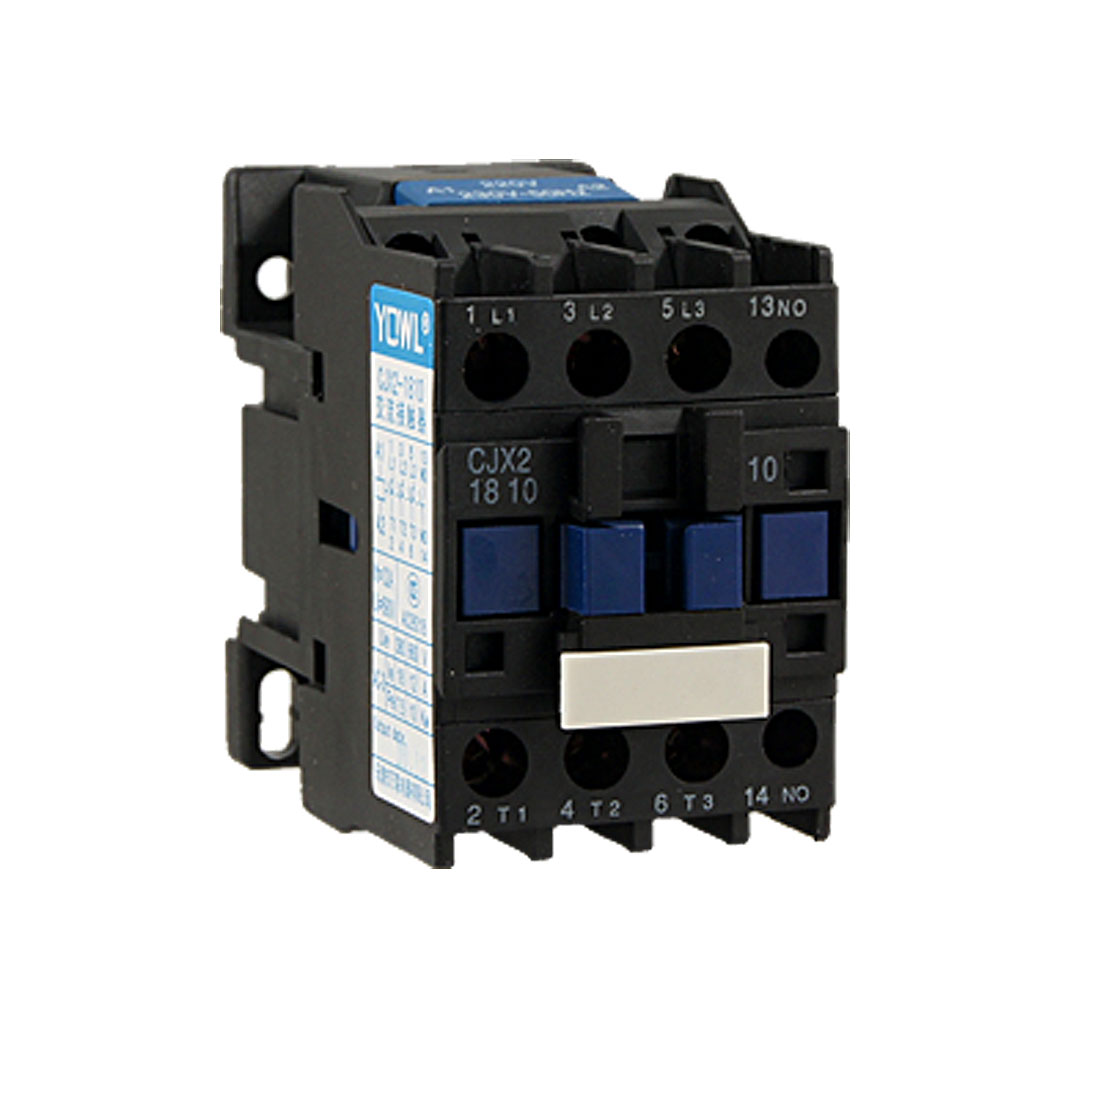 CJX2-1810 Motor Control AC Contactor 18A 3P 3 Phase 1NO Coil 220V 50Hz